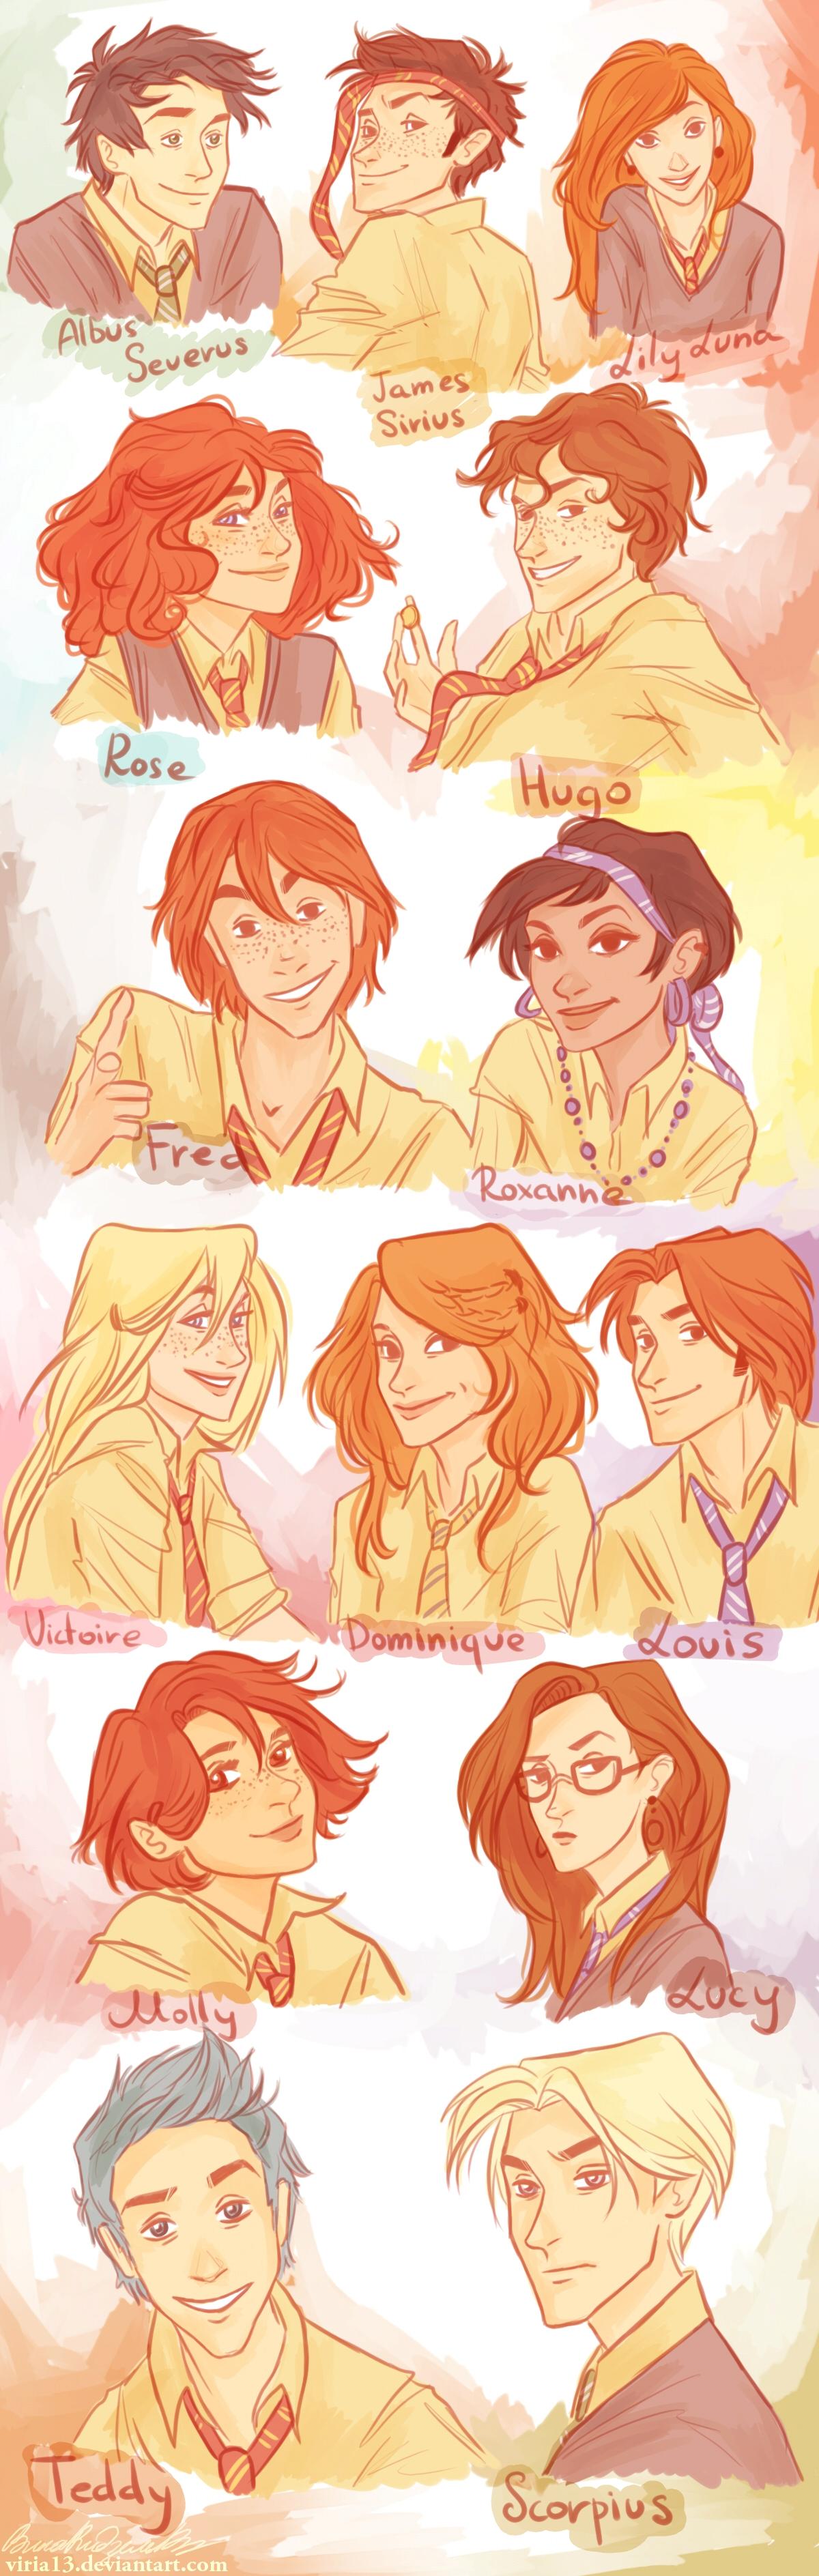 Harry Potter Image #744690 - Zerochan Anime Image Board